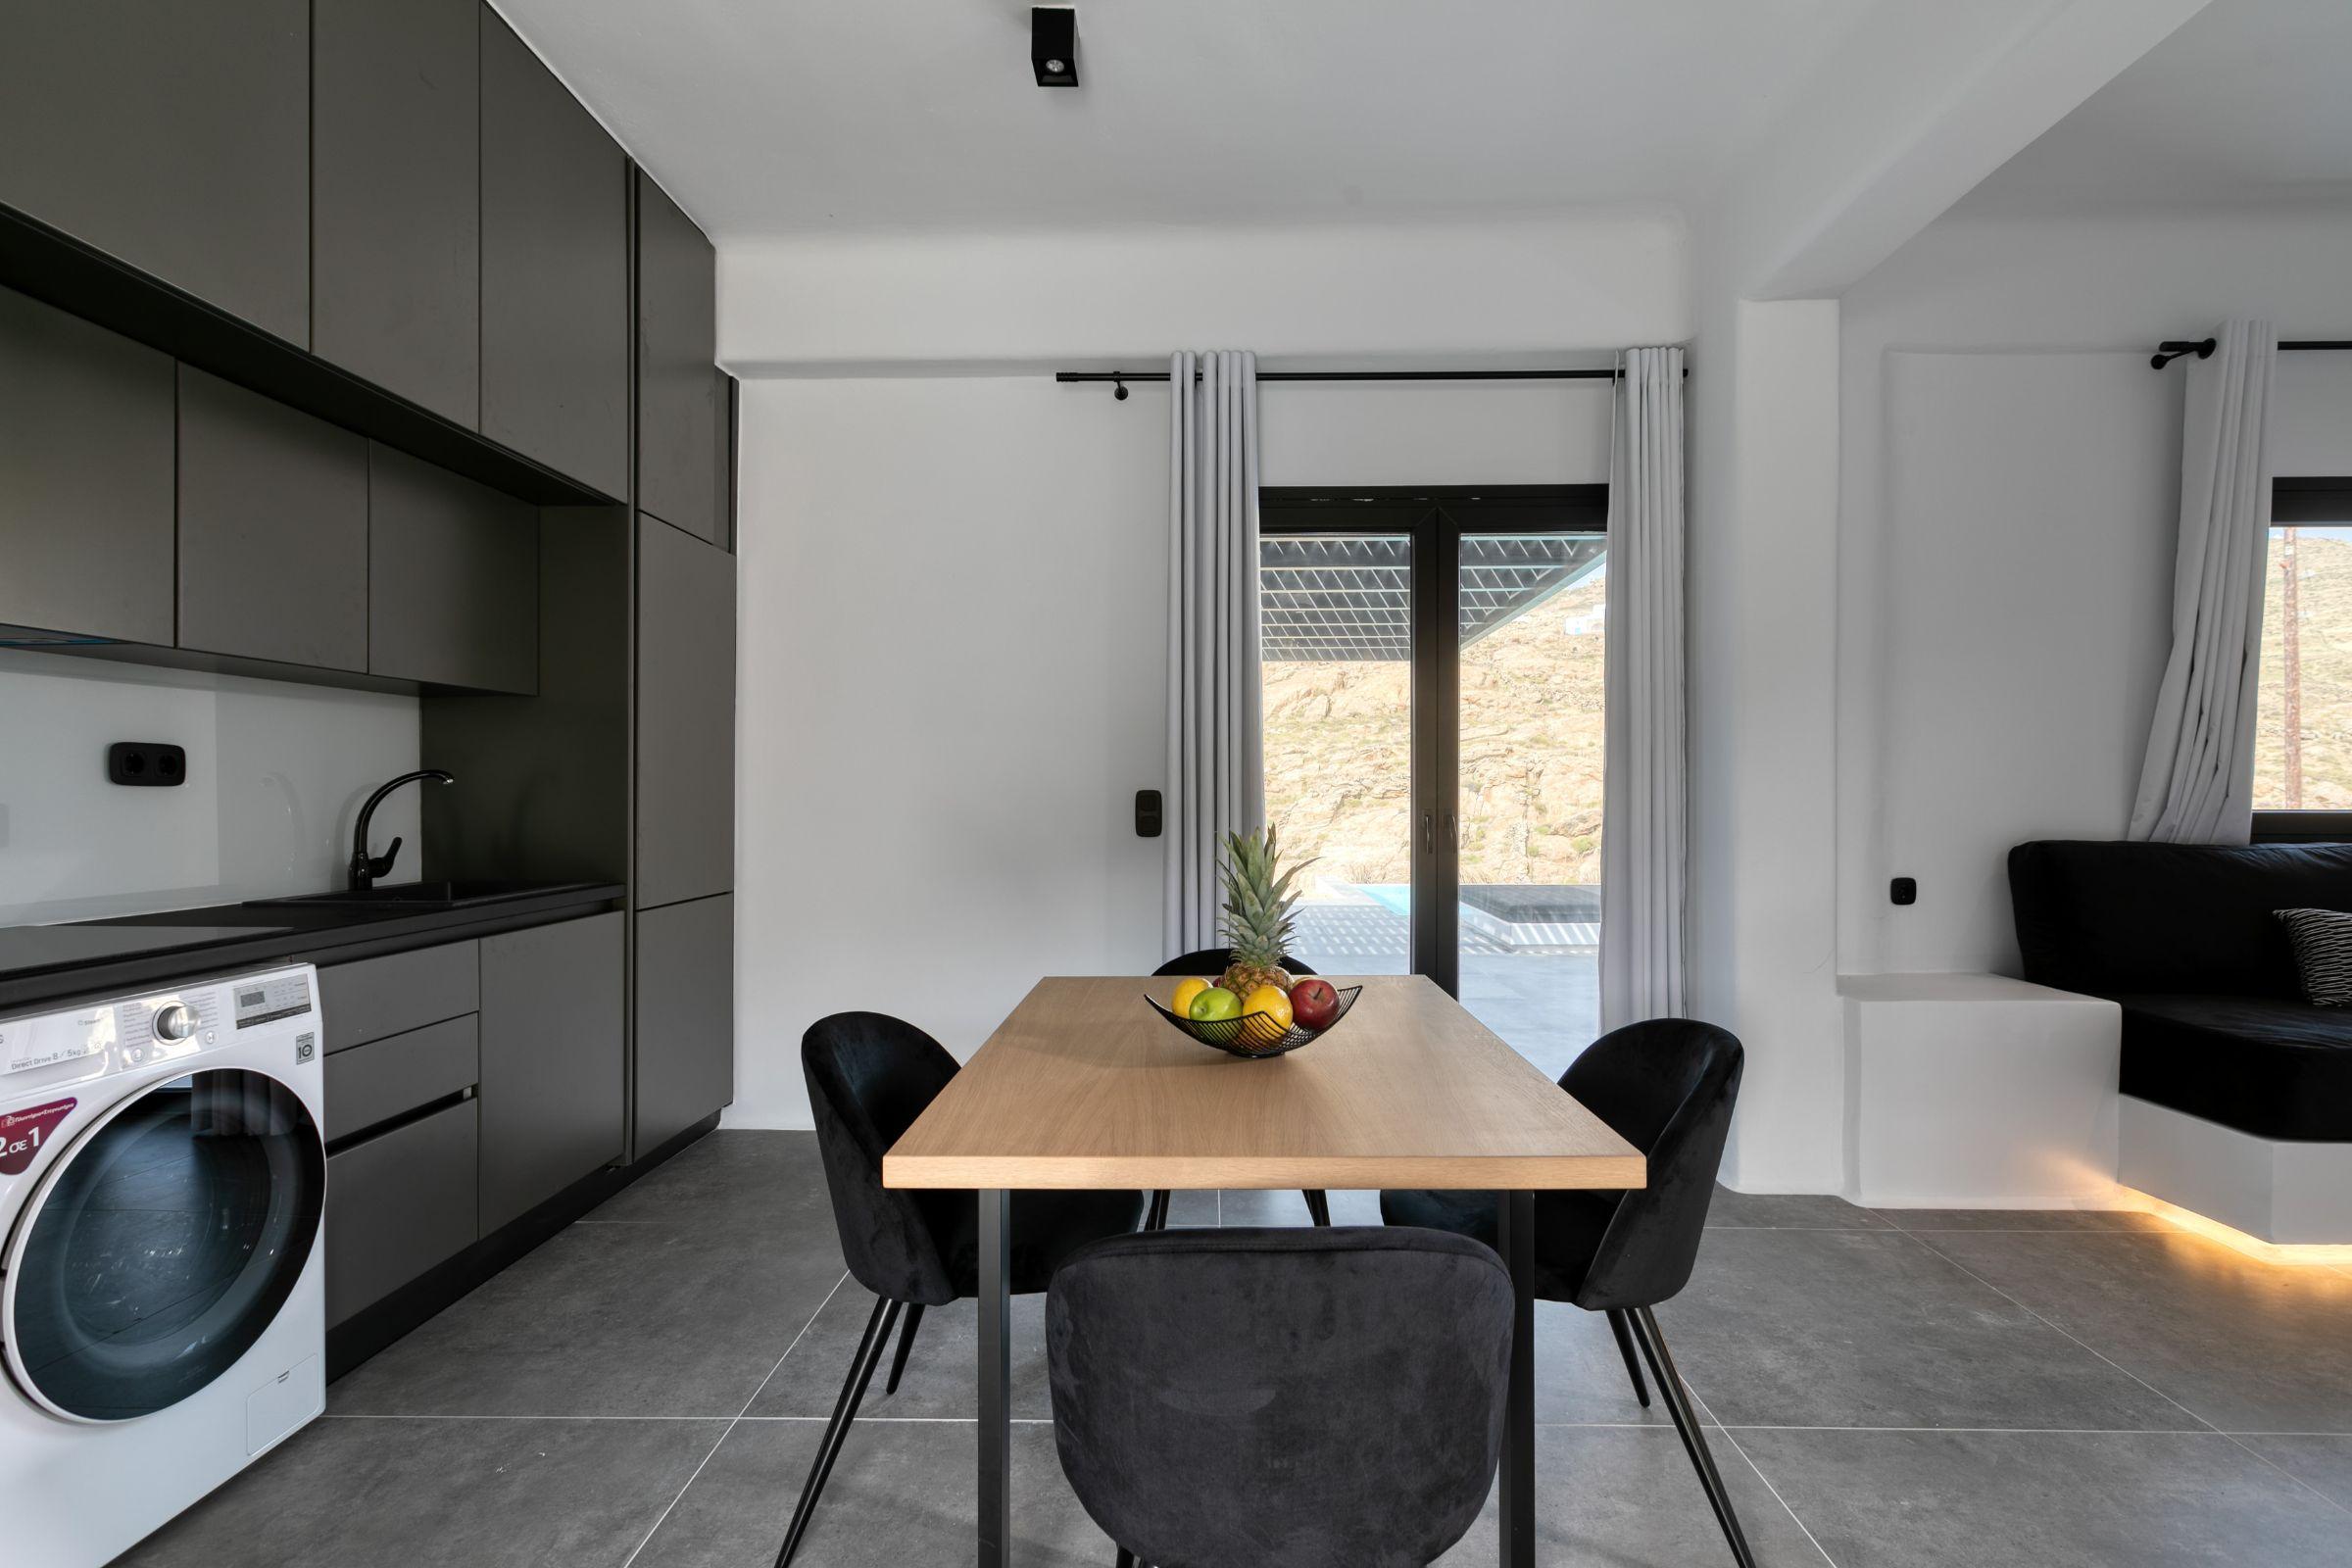 villa arteta ftelia kitchen